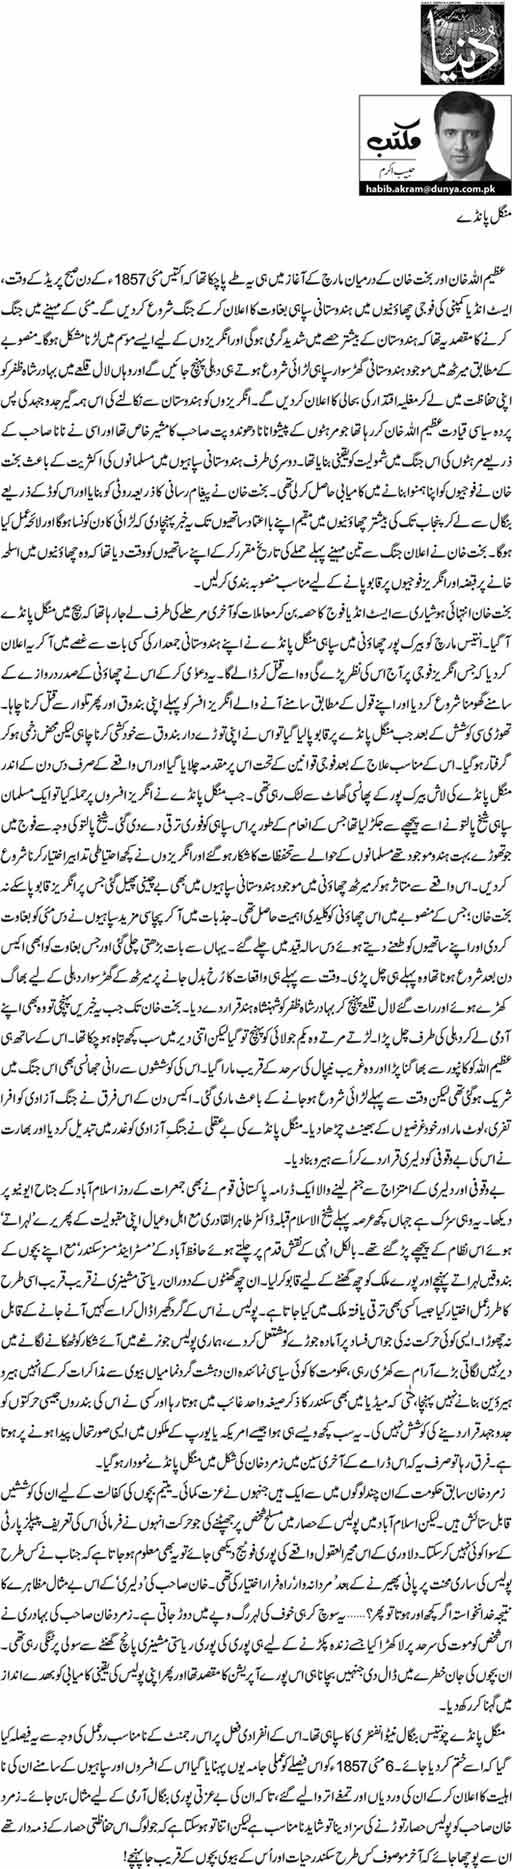 Mangal Panday - Habib Akram